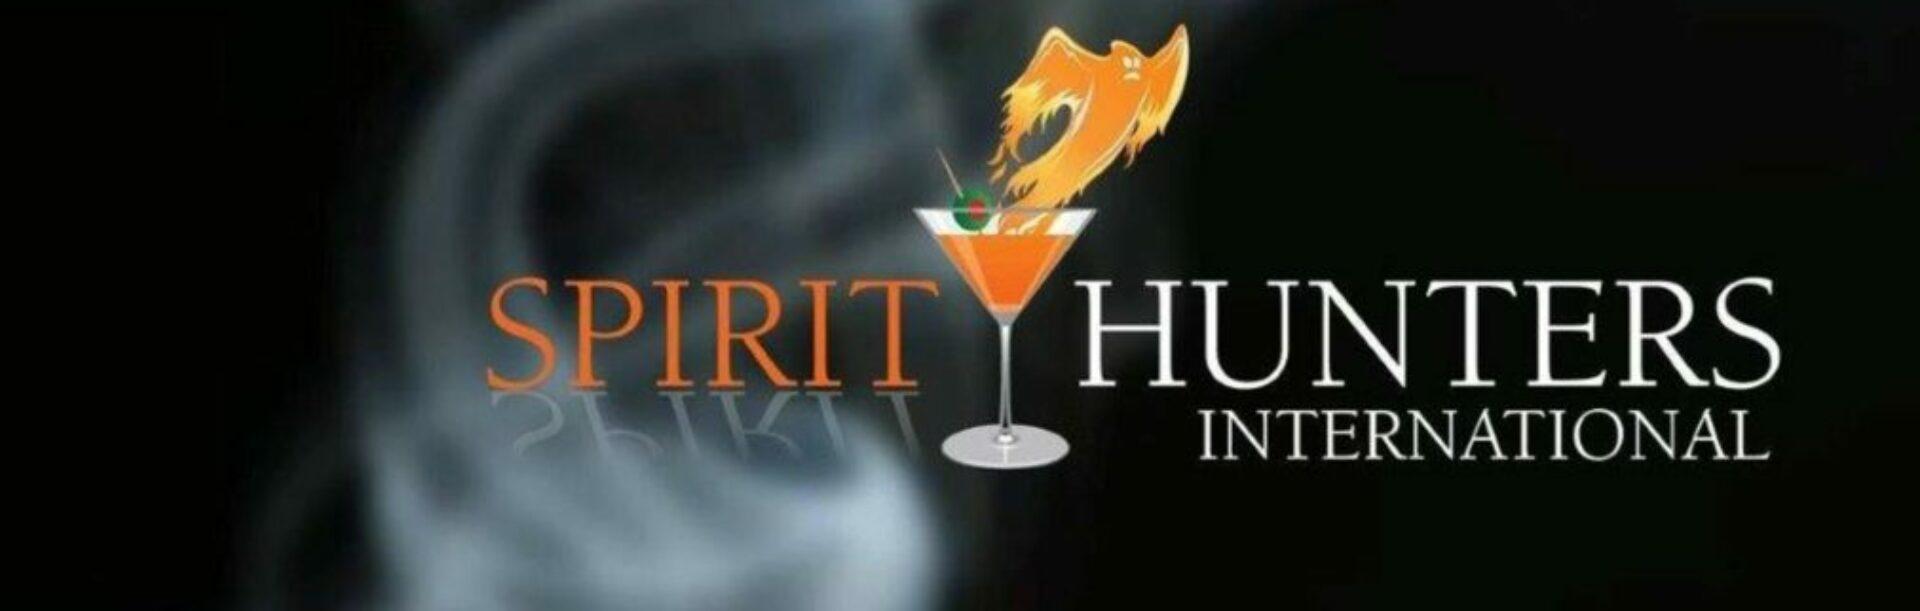 Spirit Hunters International